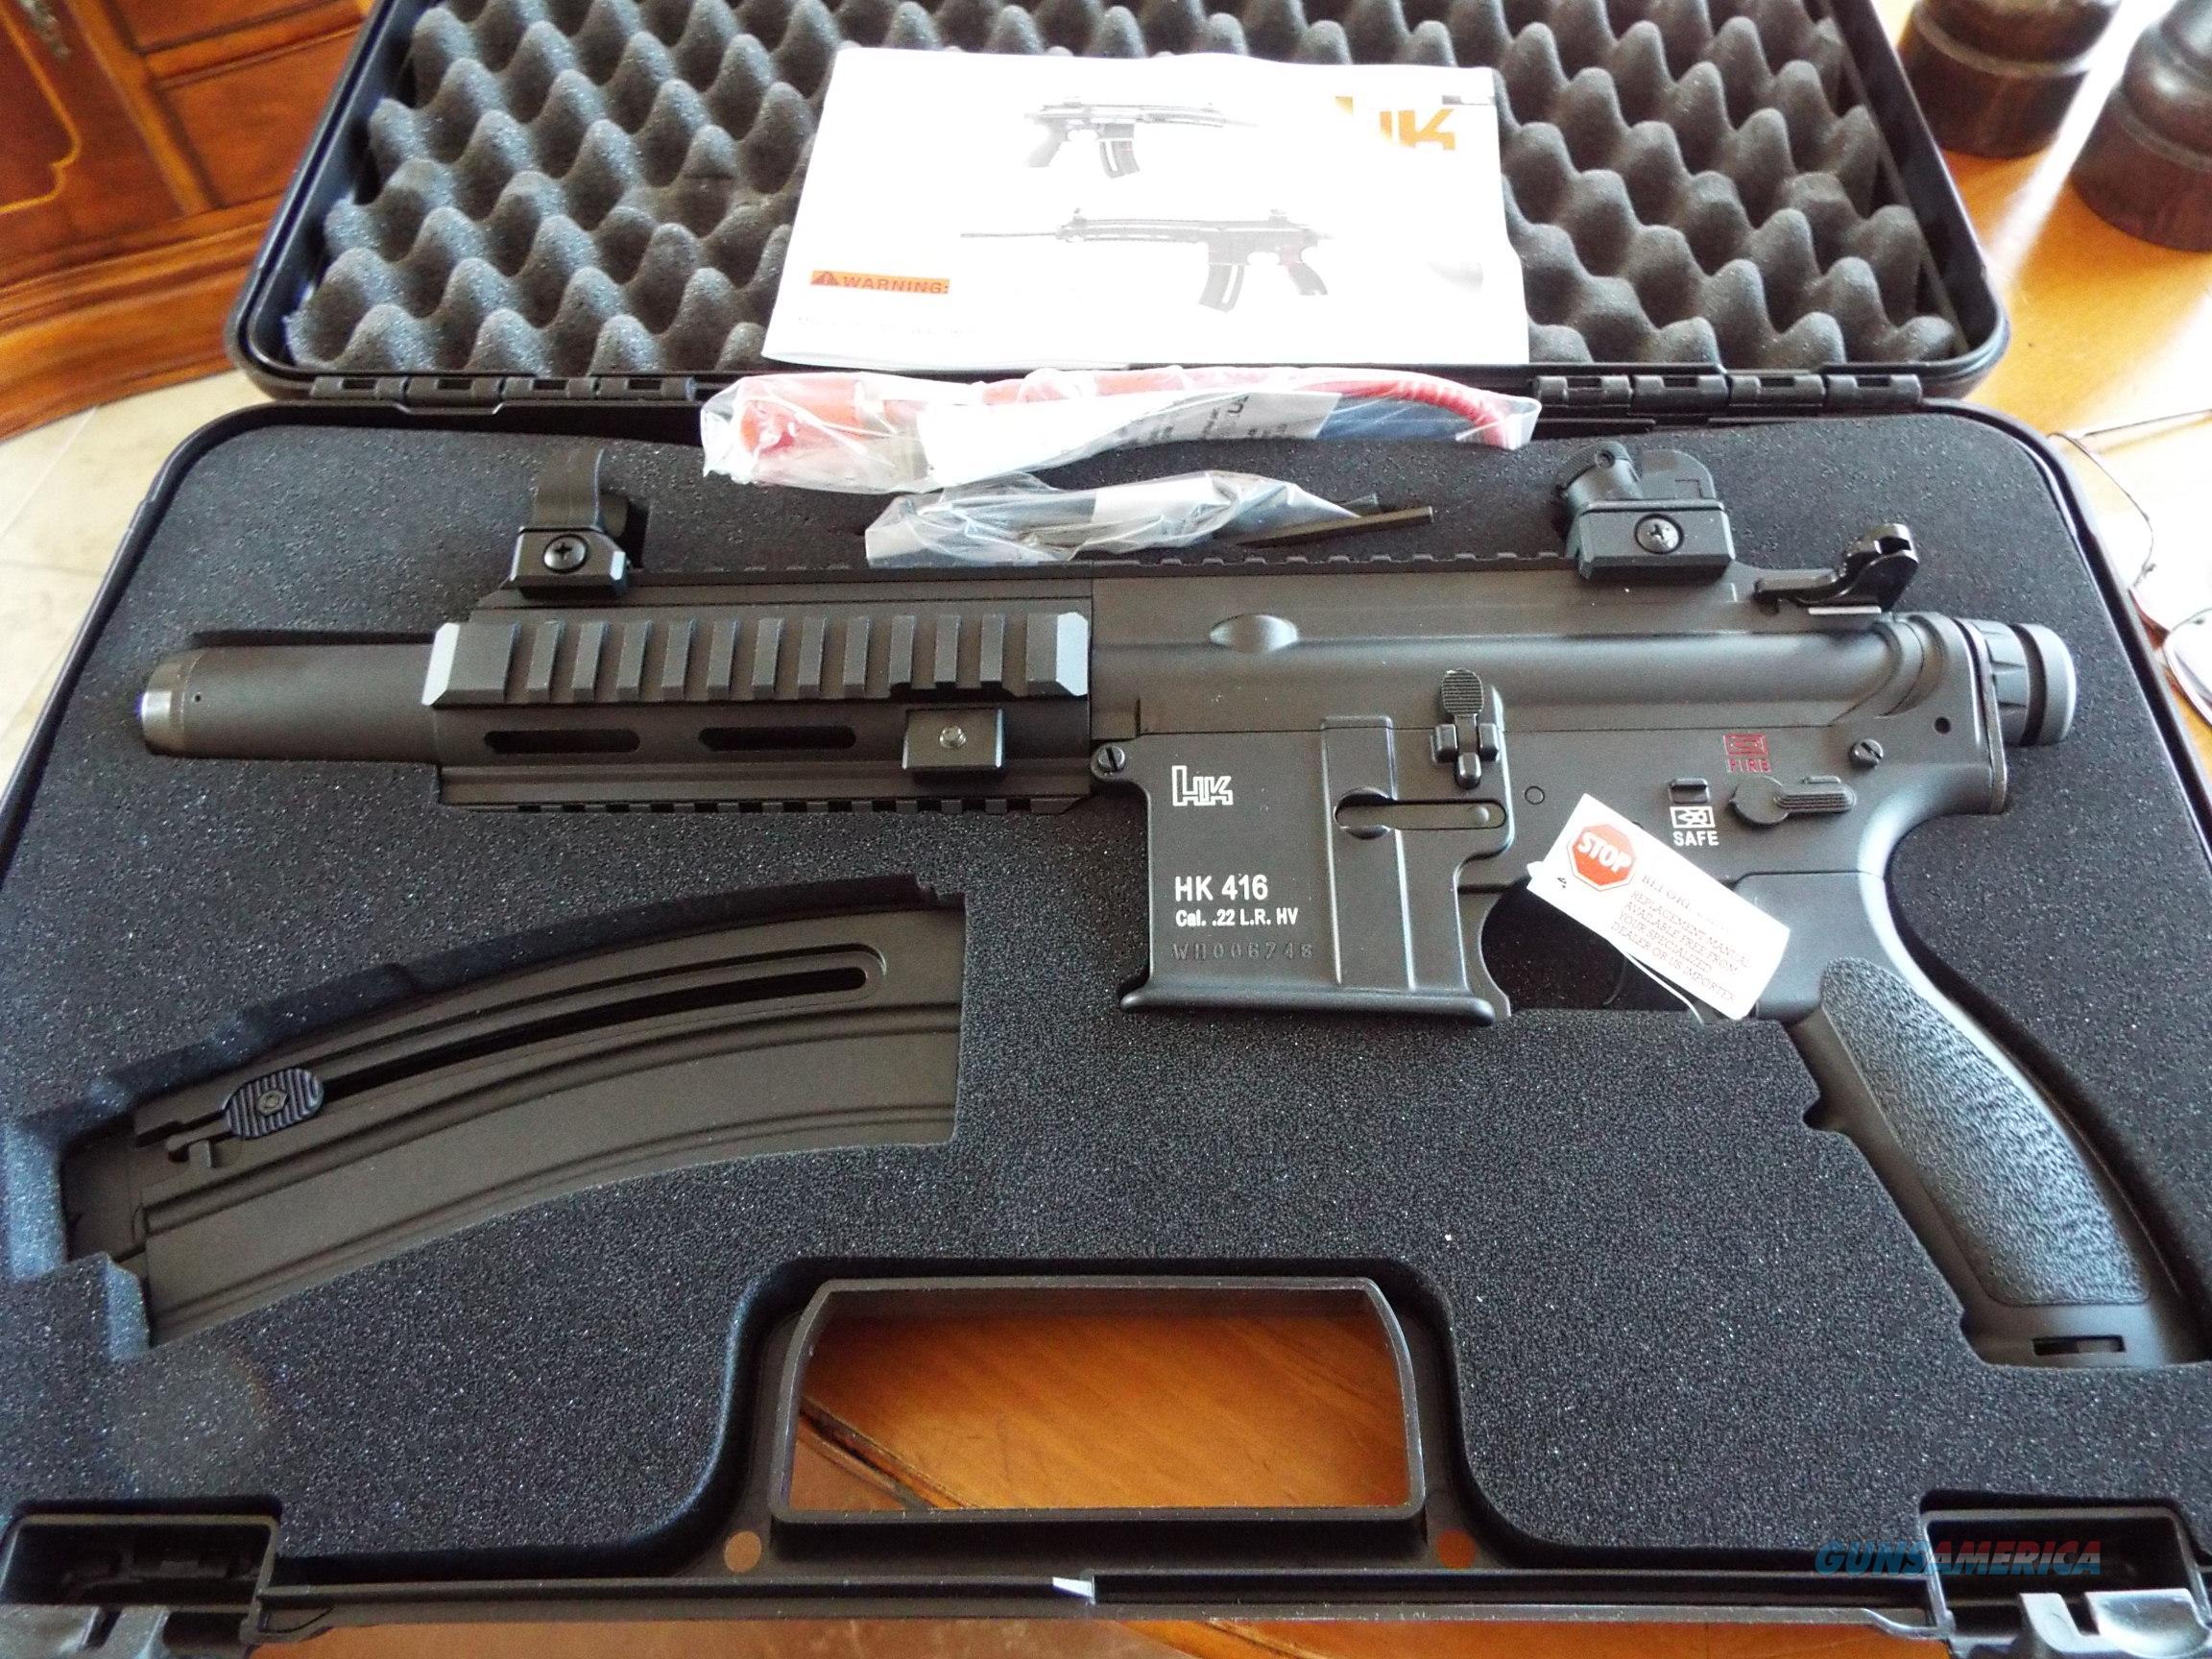 HK 416 High Capacity Pistol 22 LR New! LAYAWAY OPTION 5780303